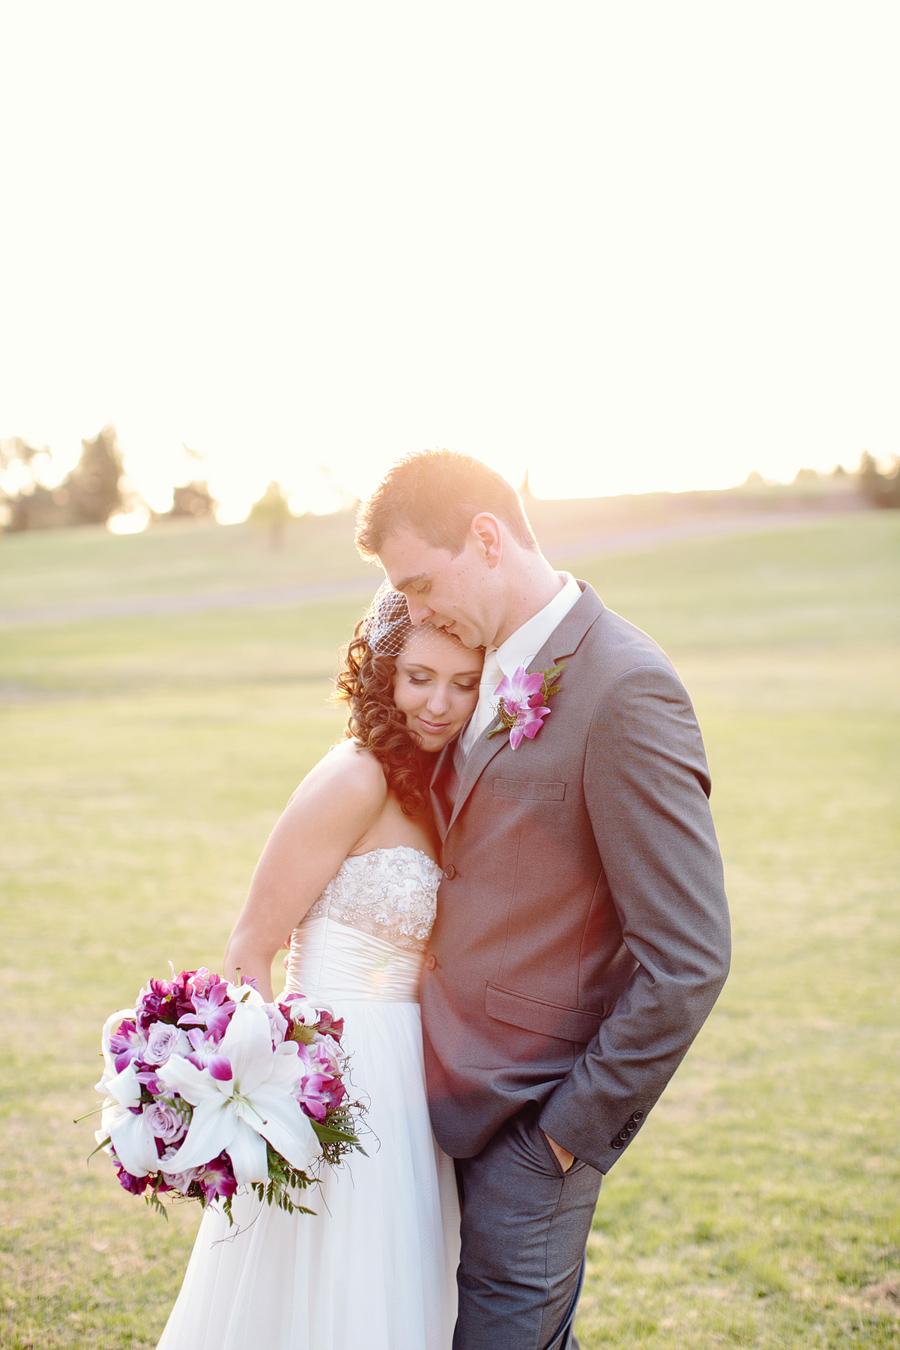 Sydney Wedding Photographers: Couple portrait